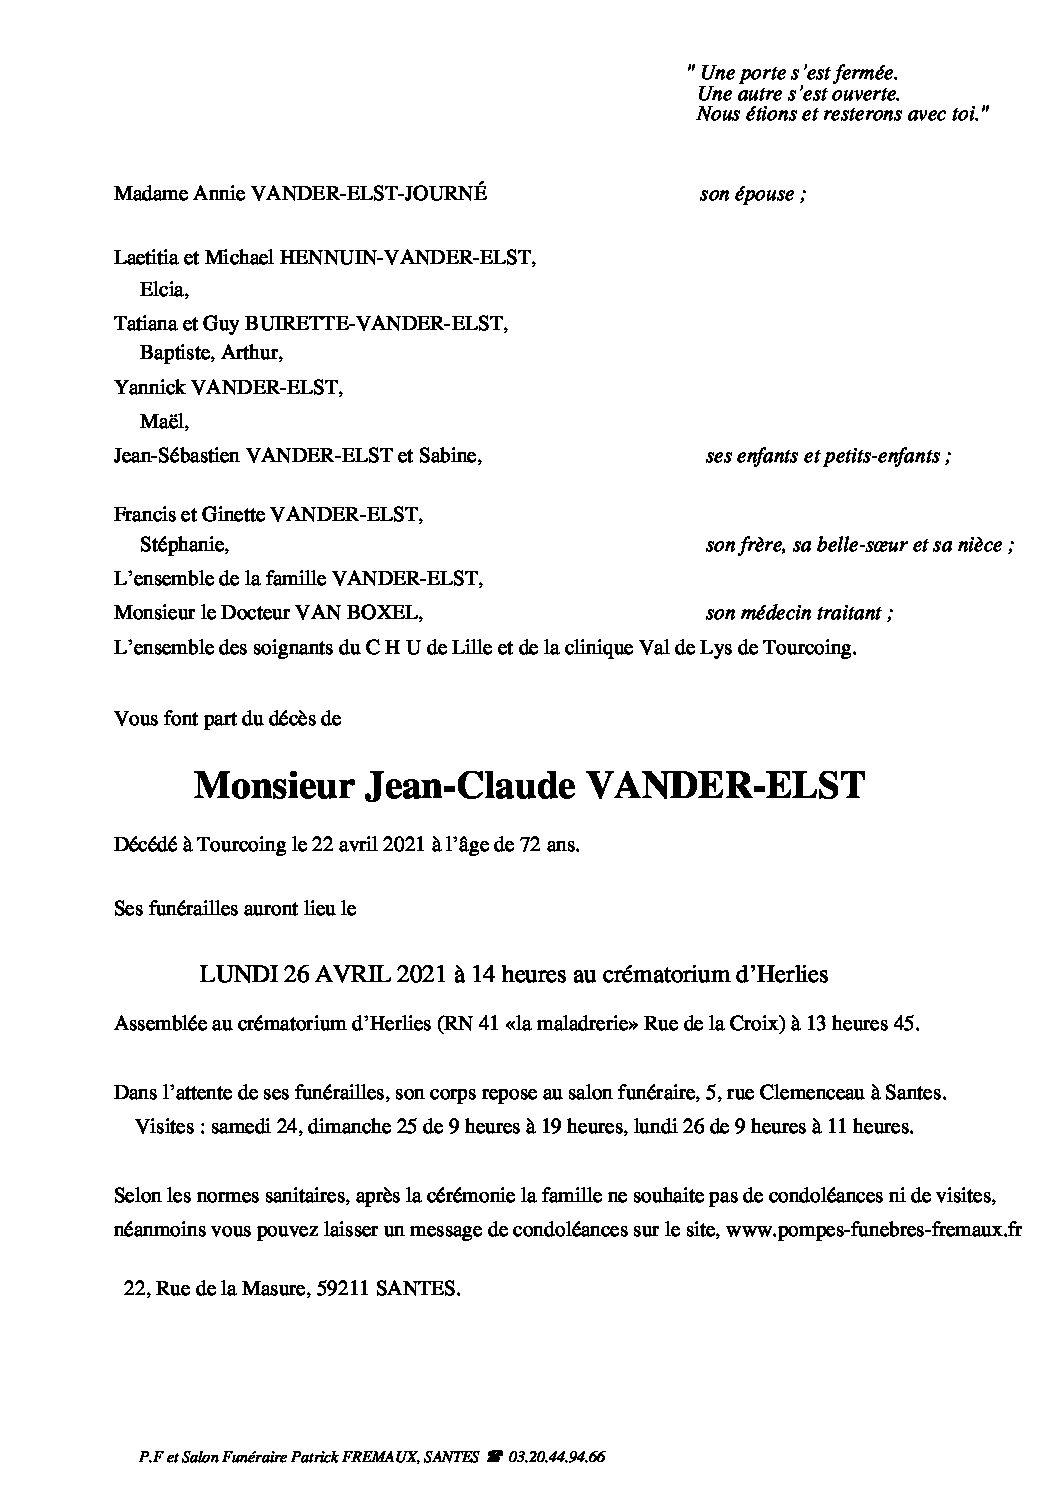 Monsieur Jean-Claude VANDER-ELST